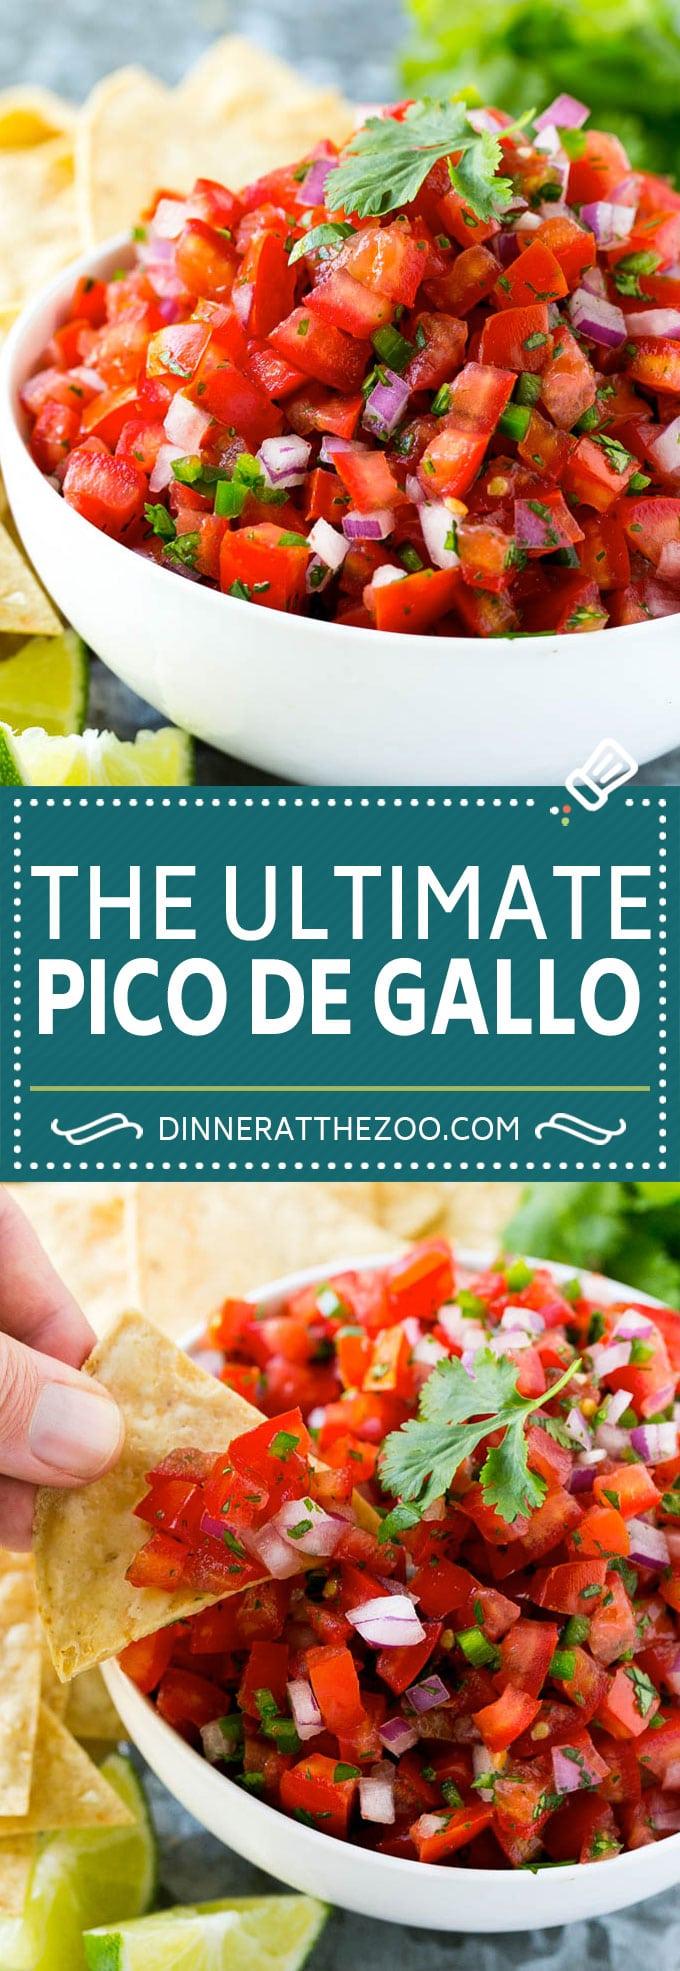 Pico de Gallo Recipe | Homemade Salsa Recipe | Salsa Fresca Recipe #salsa #salsafresca #picodegallo #snack #appetizer #dinneratthezoo